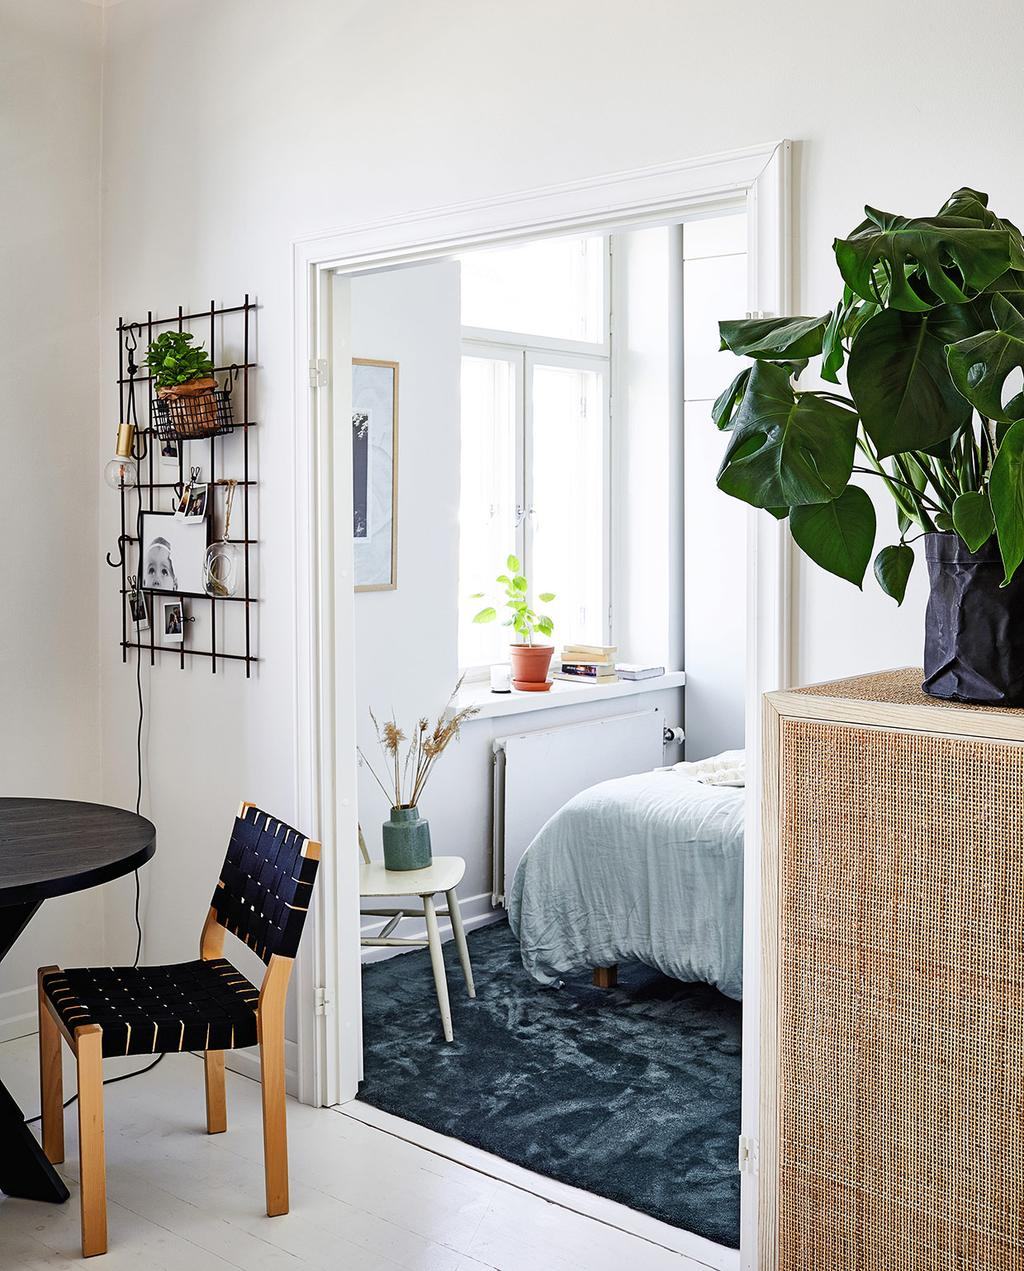 vtwonen special tiny houses | ronde tafel in deuropening